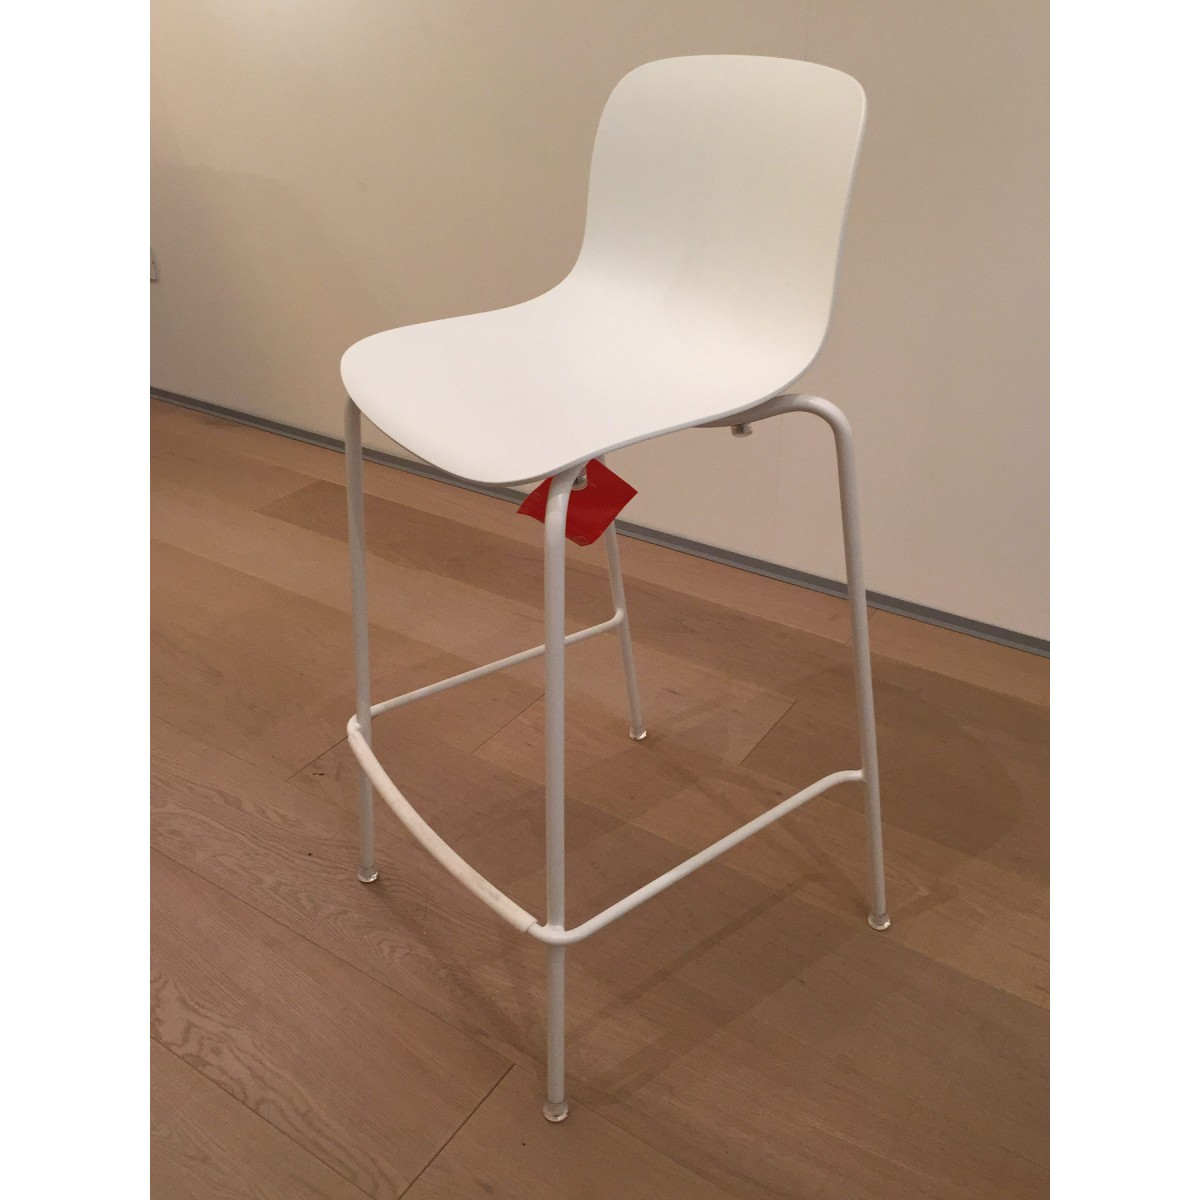 http://www.desout.com/media/catalog/product/cache/4/image/1200x1200/9df78eab33525d08d6e5fb8d27136e95/m/a/magis-white-stool.jpg